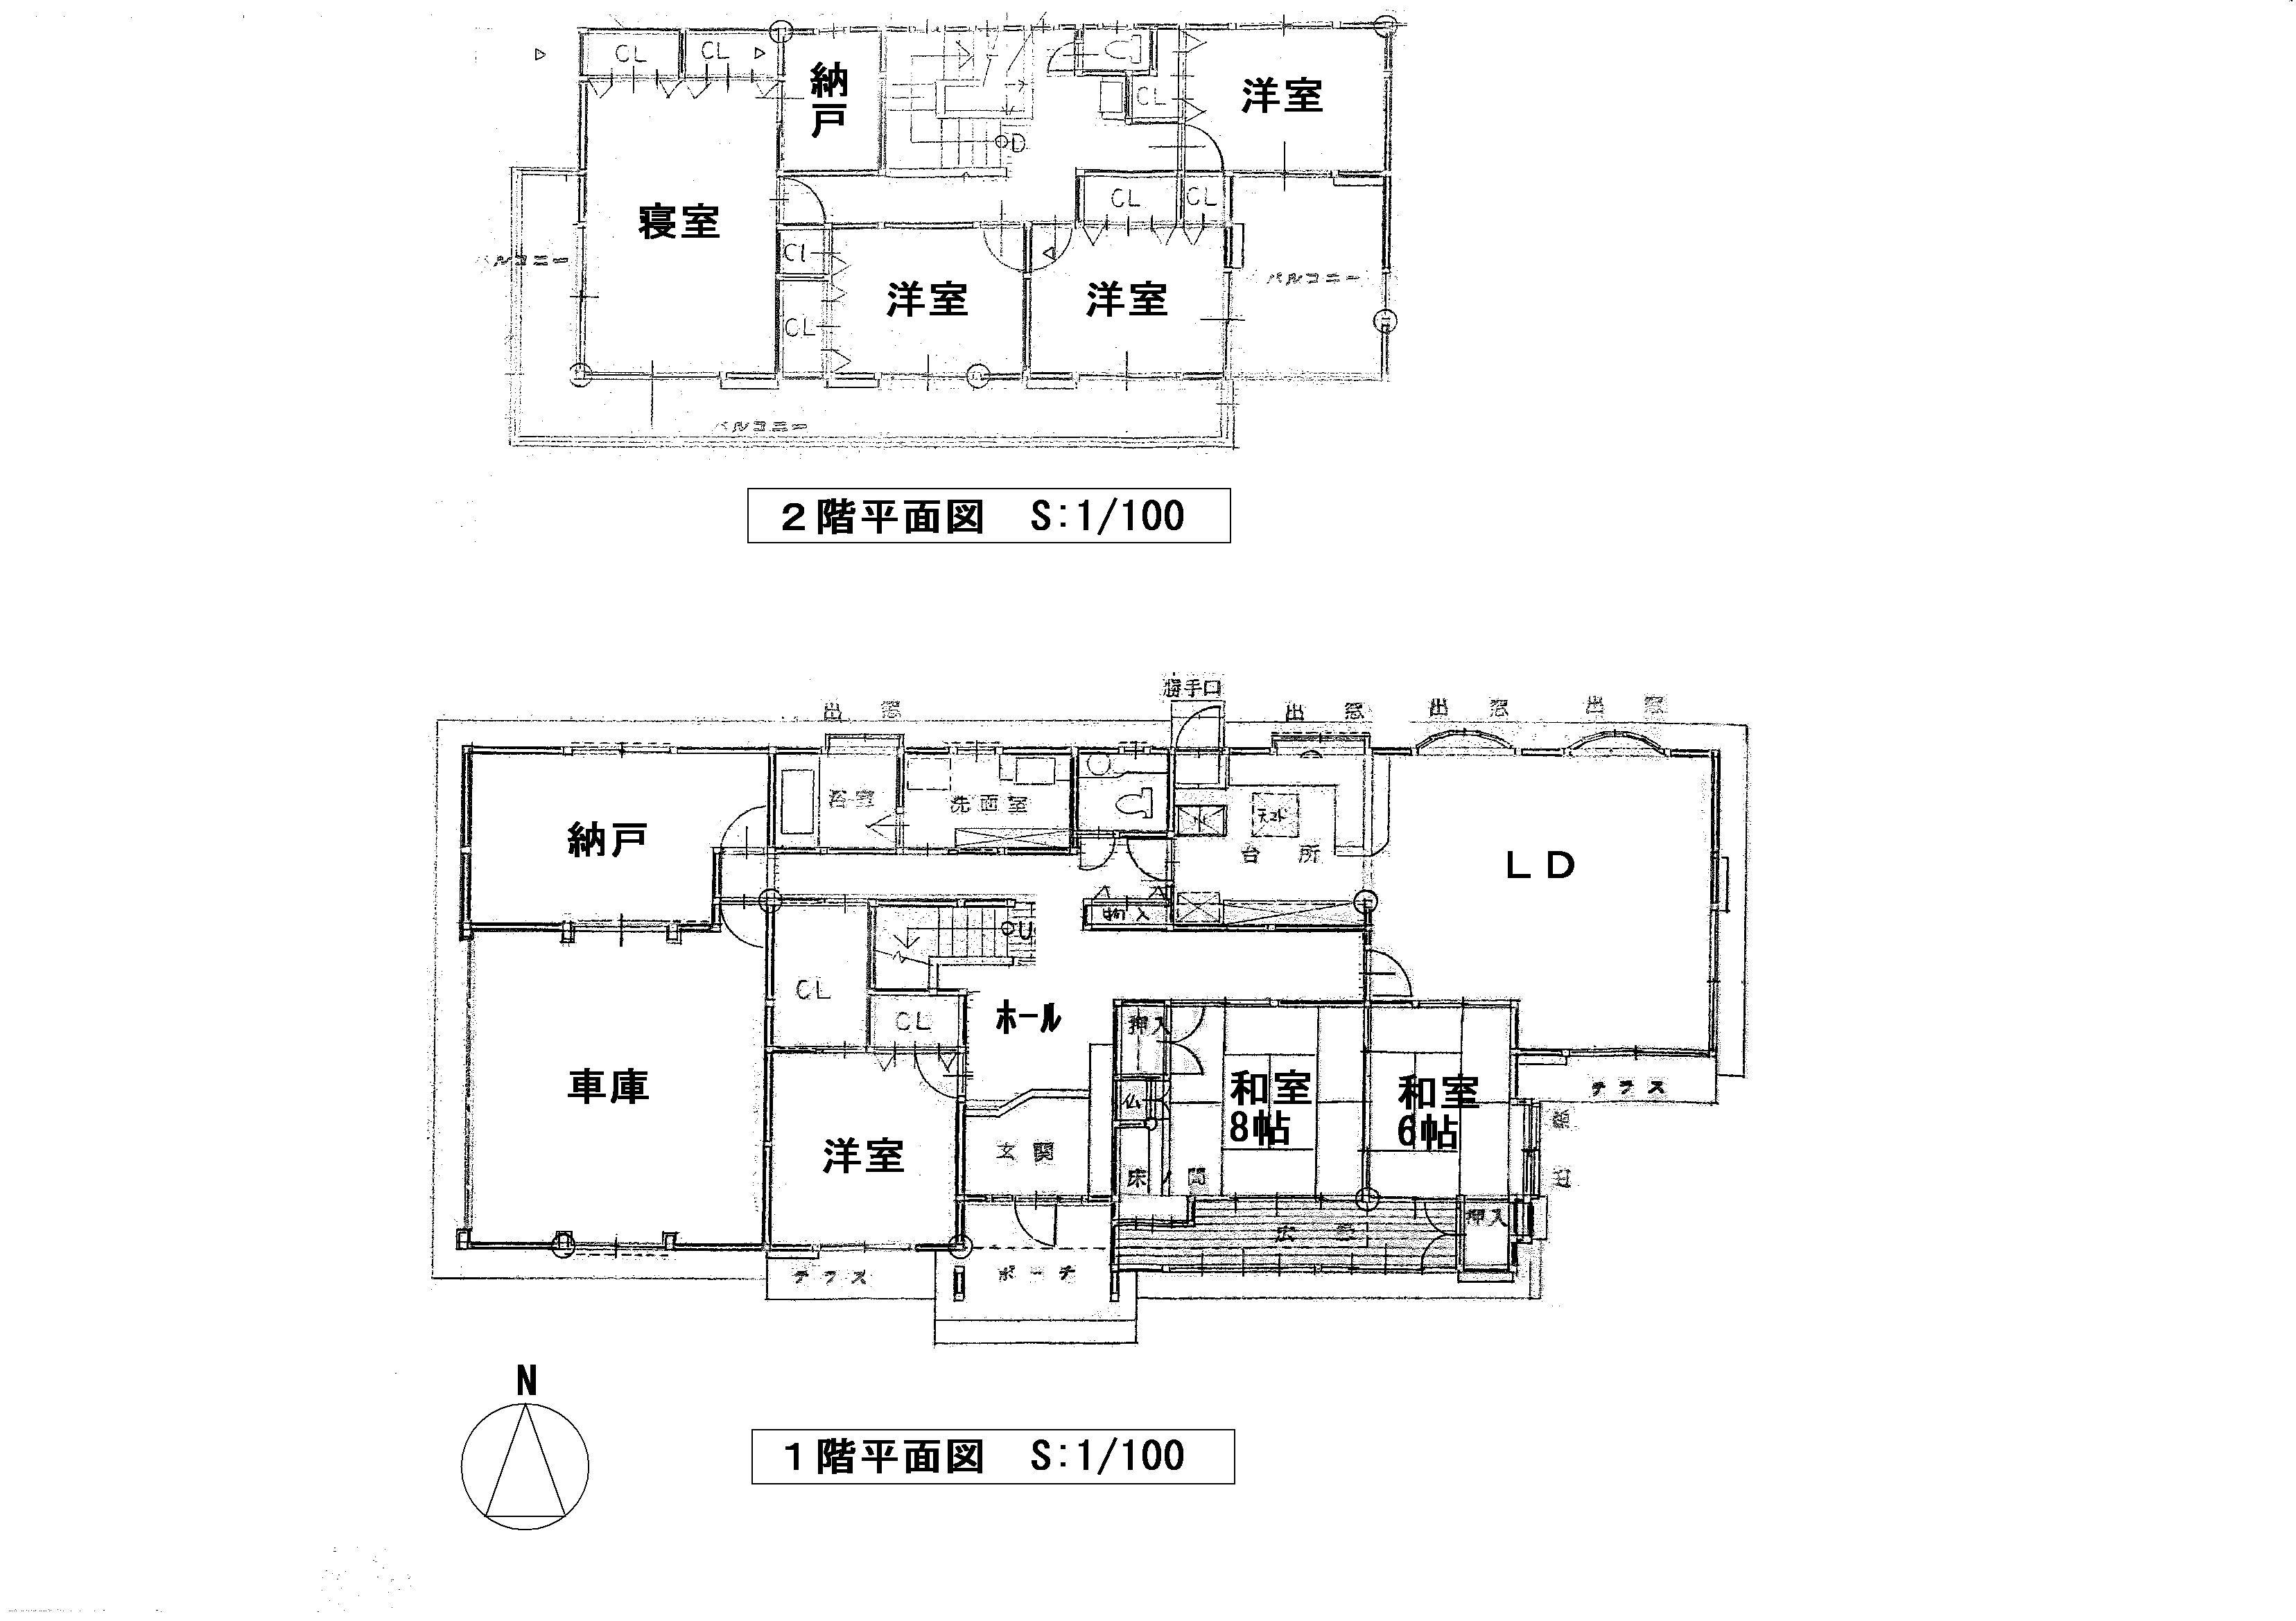 7LDK+S(86坪)